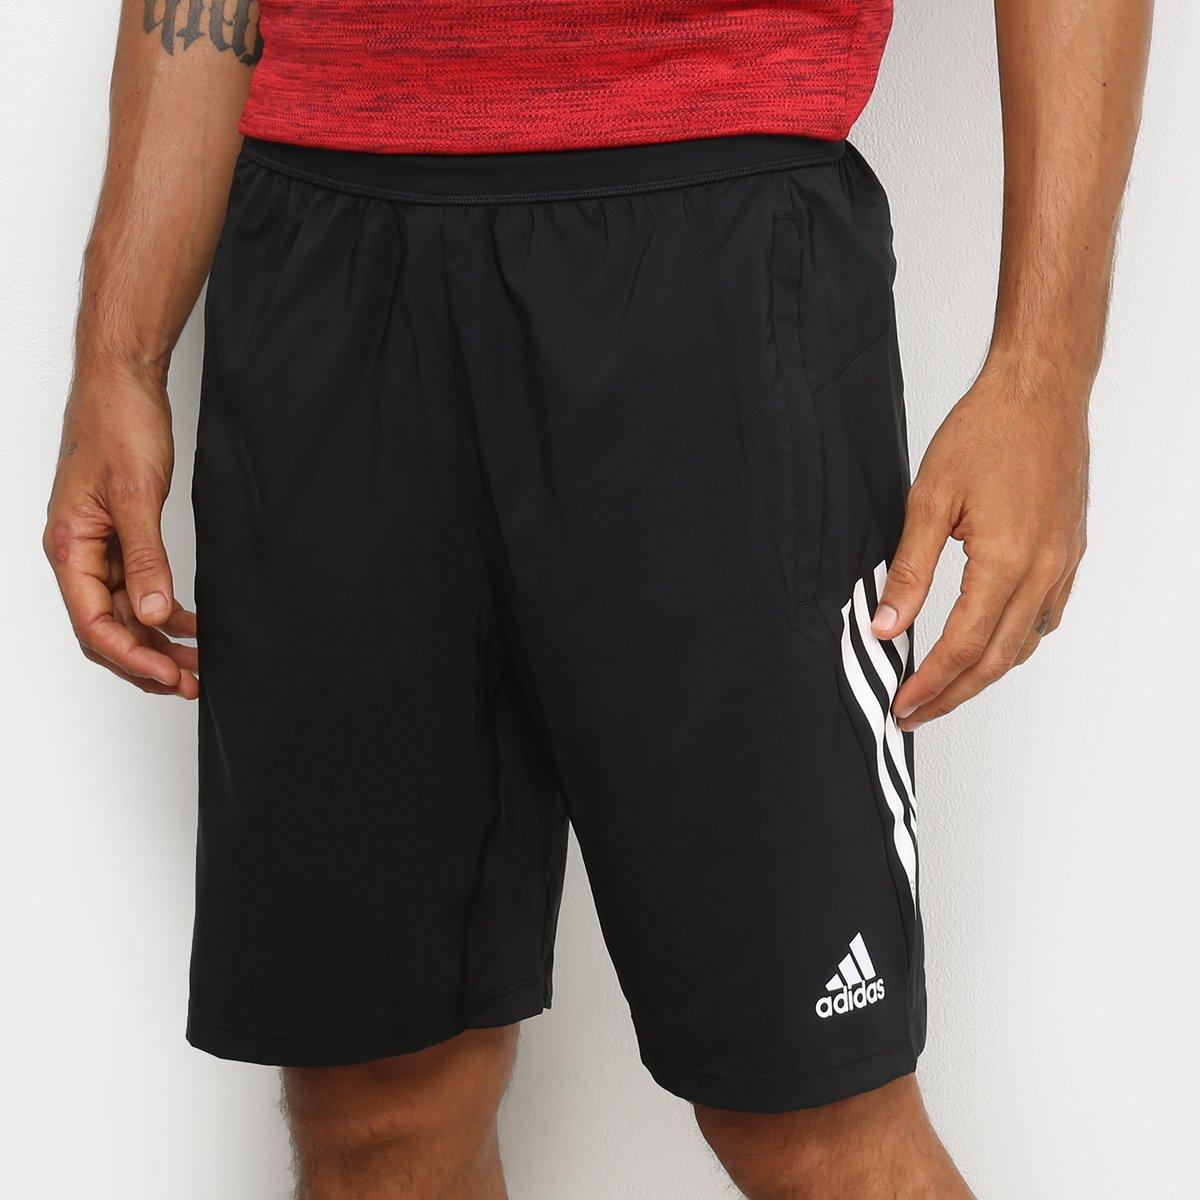 Shorts Adidas True 3S Wv Sho Masculino